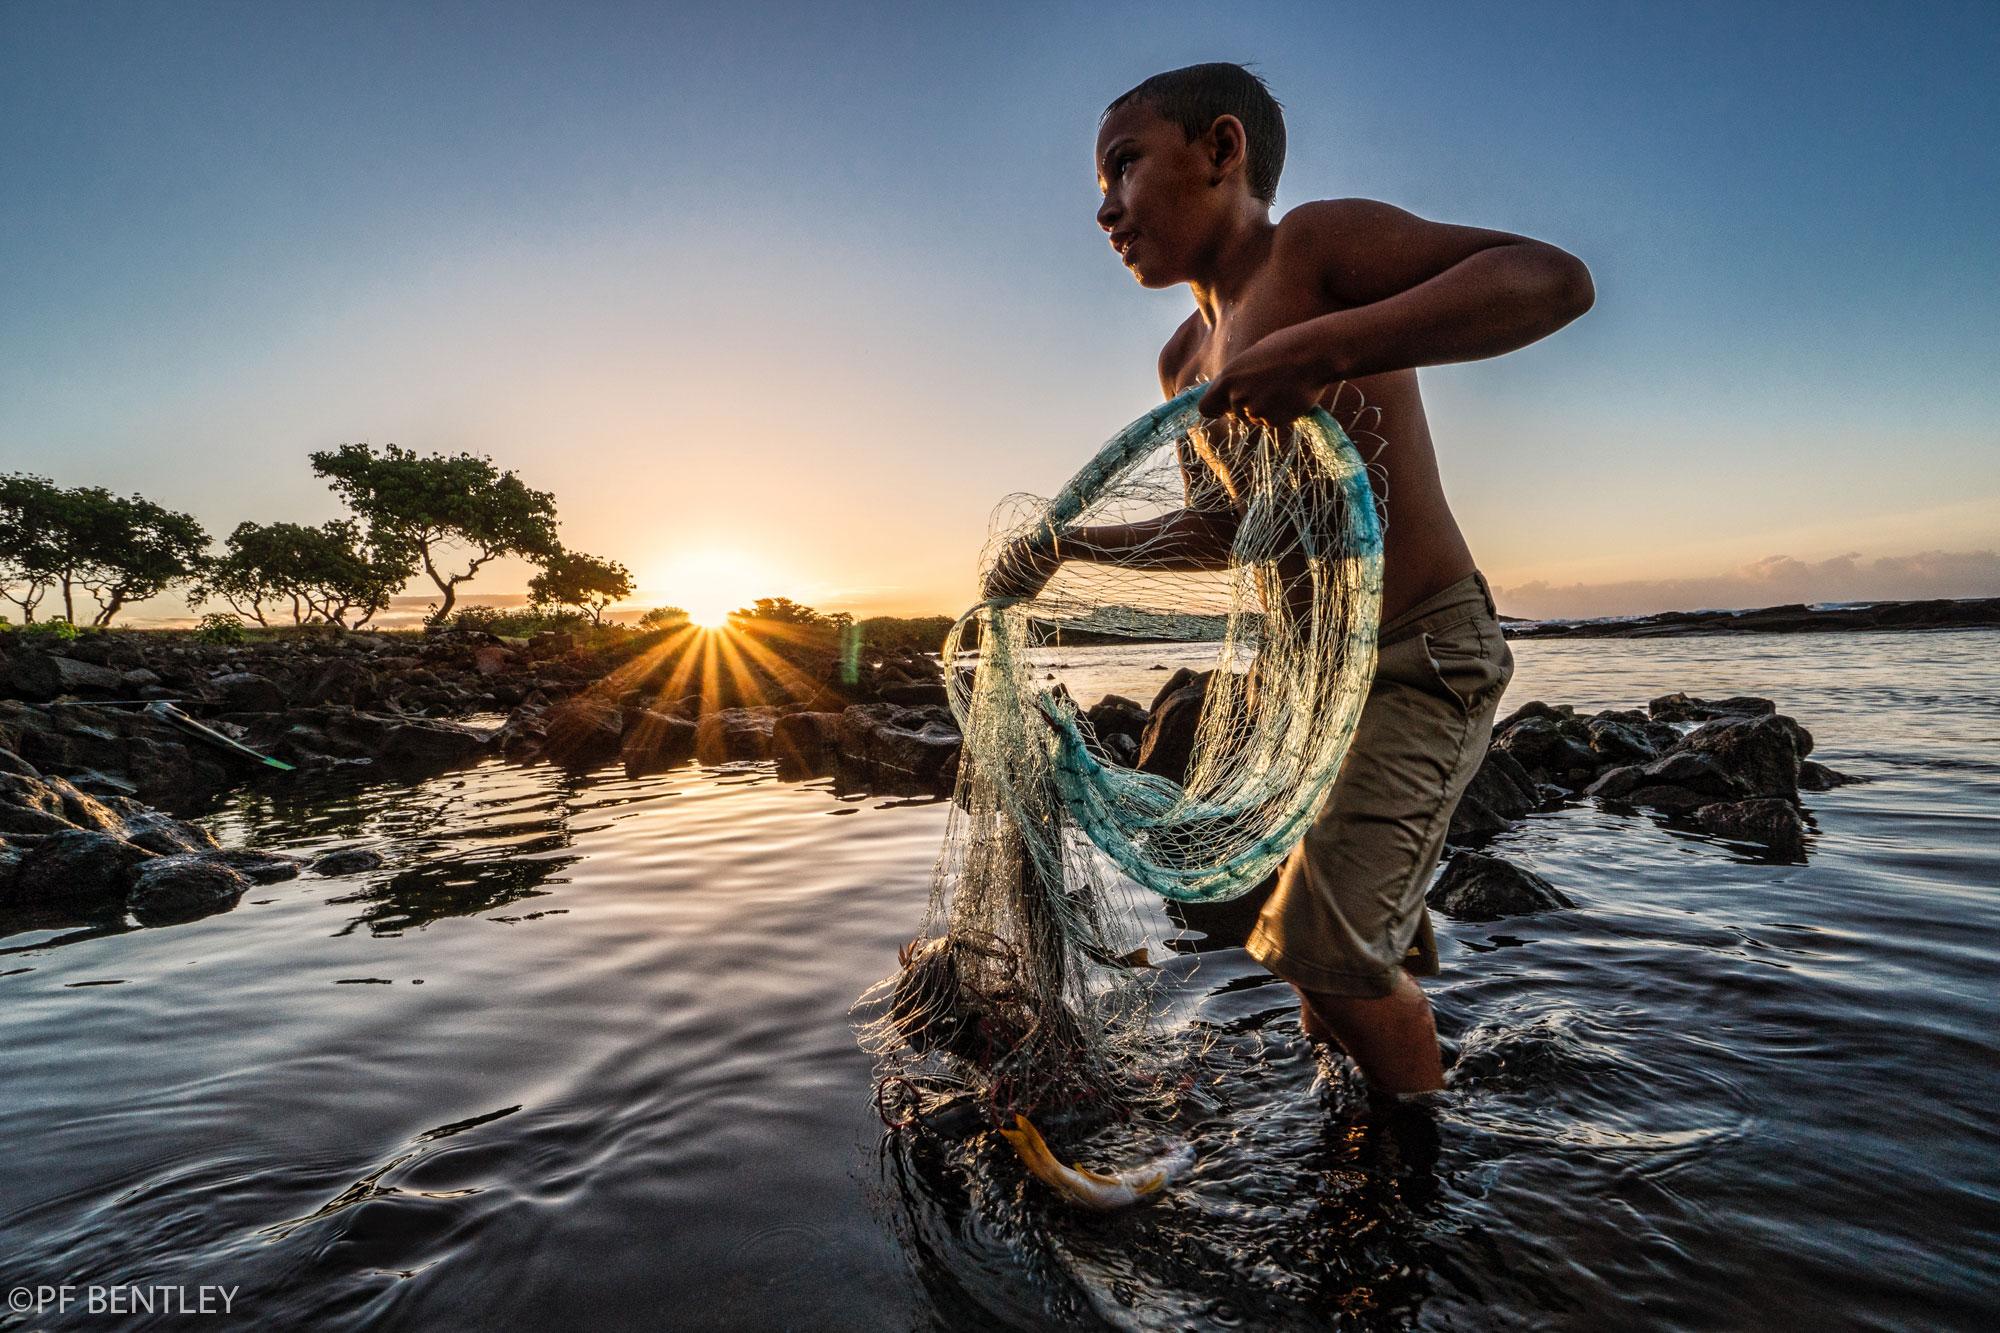 Ku'ike Luta, 8 years old gathers fish at Hono'apo. He is the nephew of Nohea Ka'awa. There is a kahakō over the u in his first name.